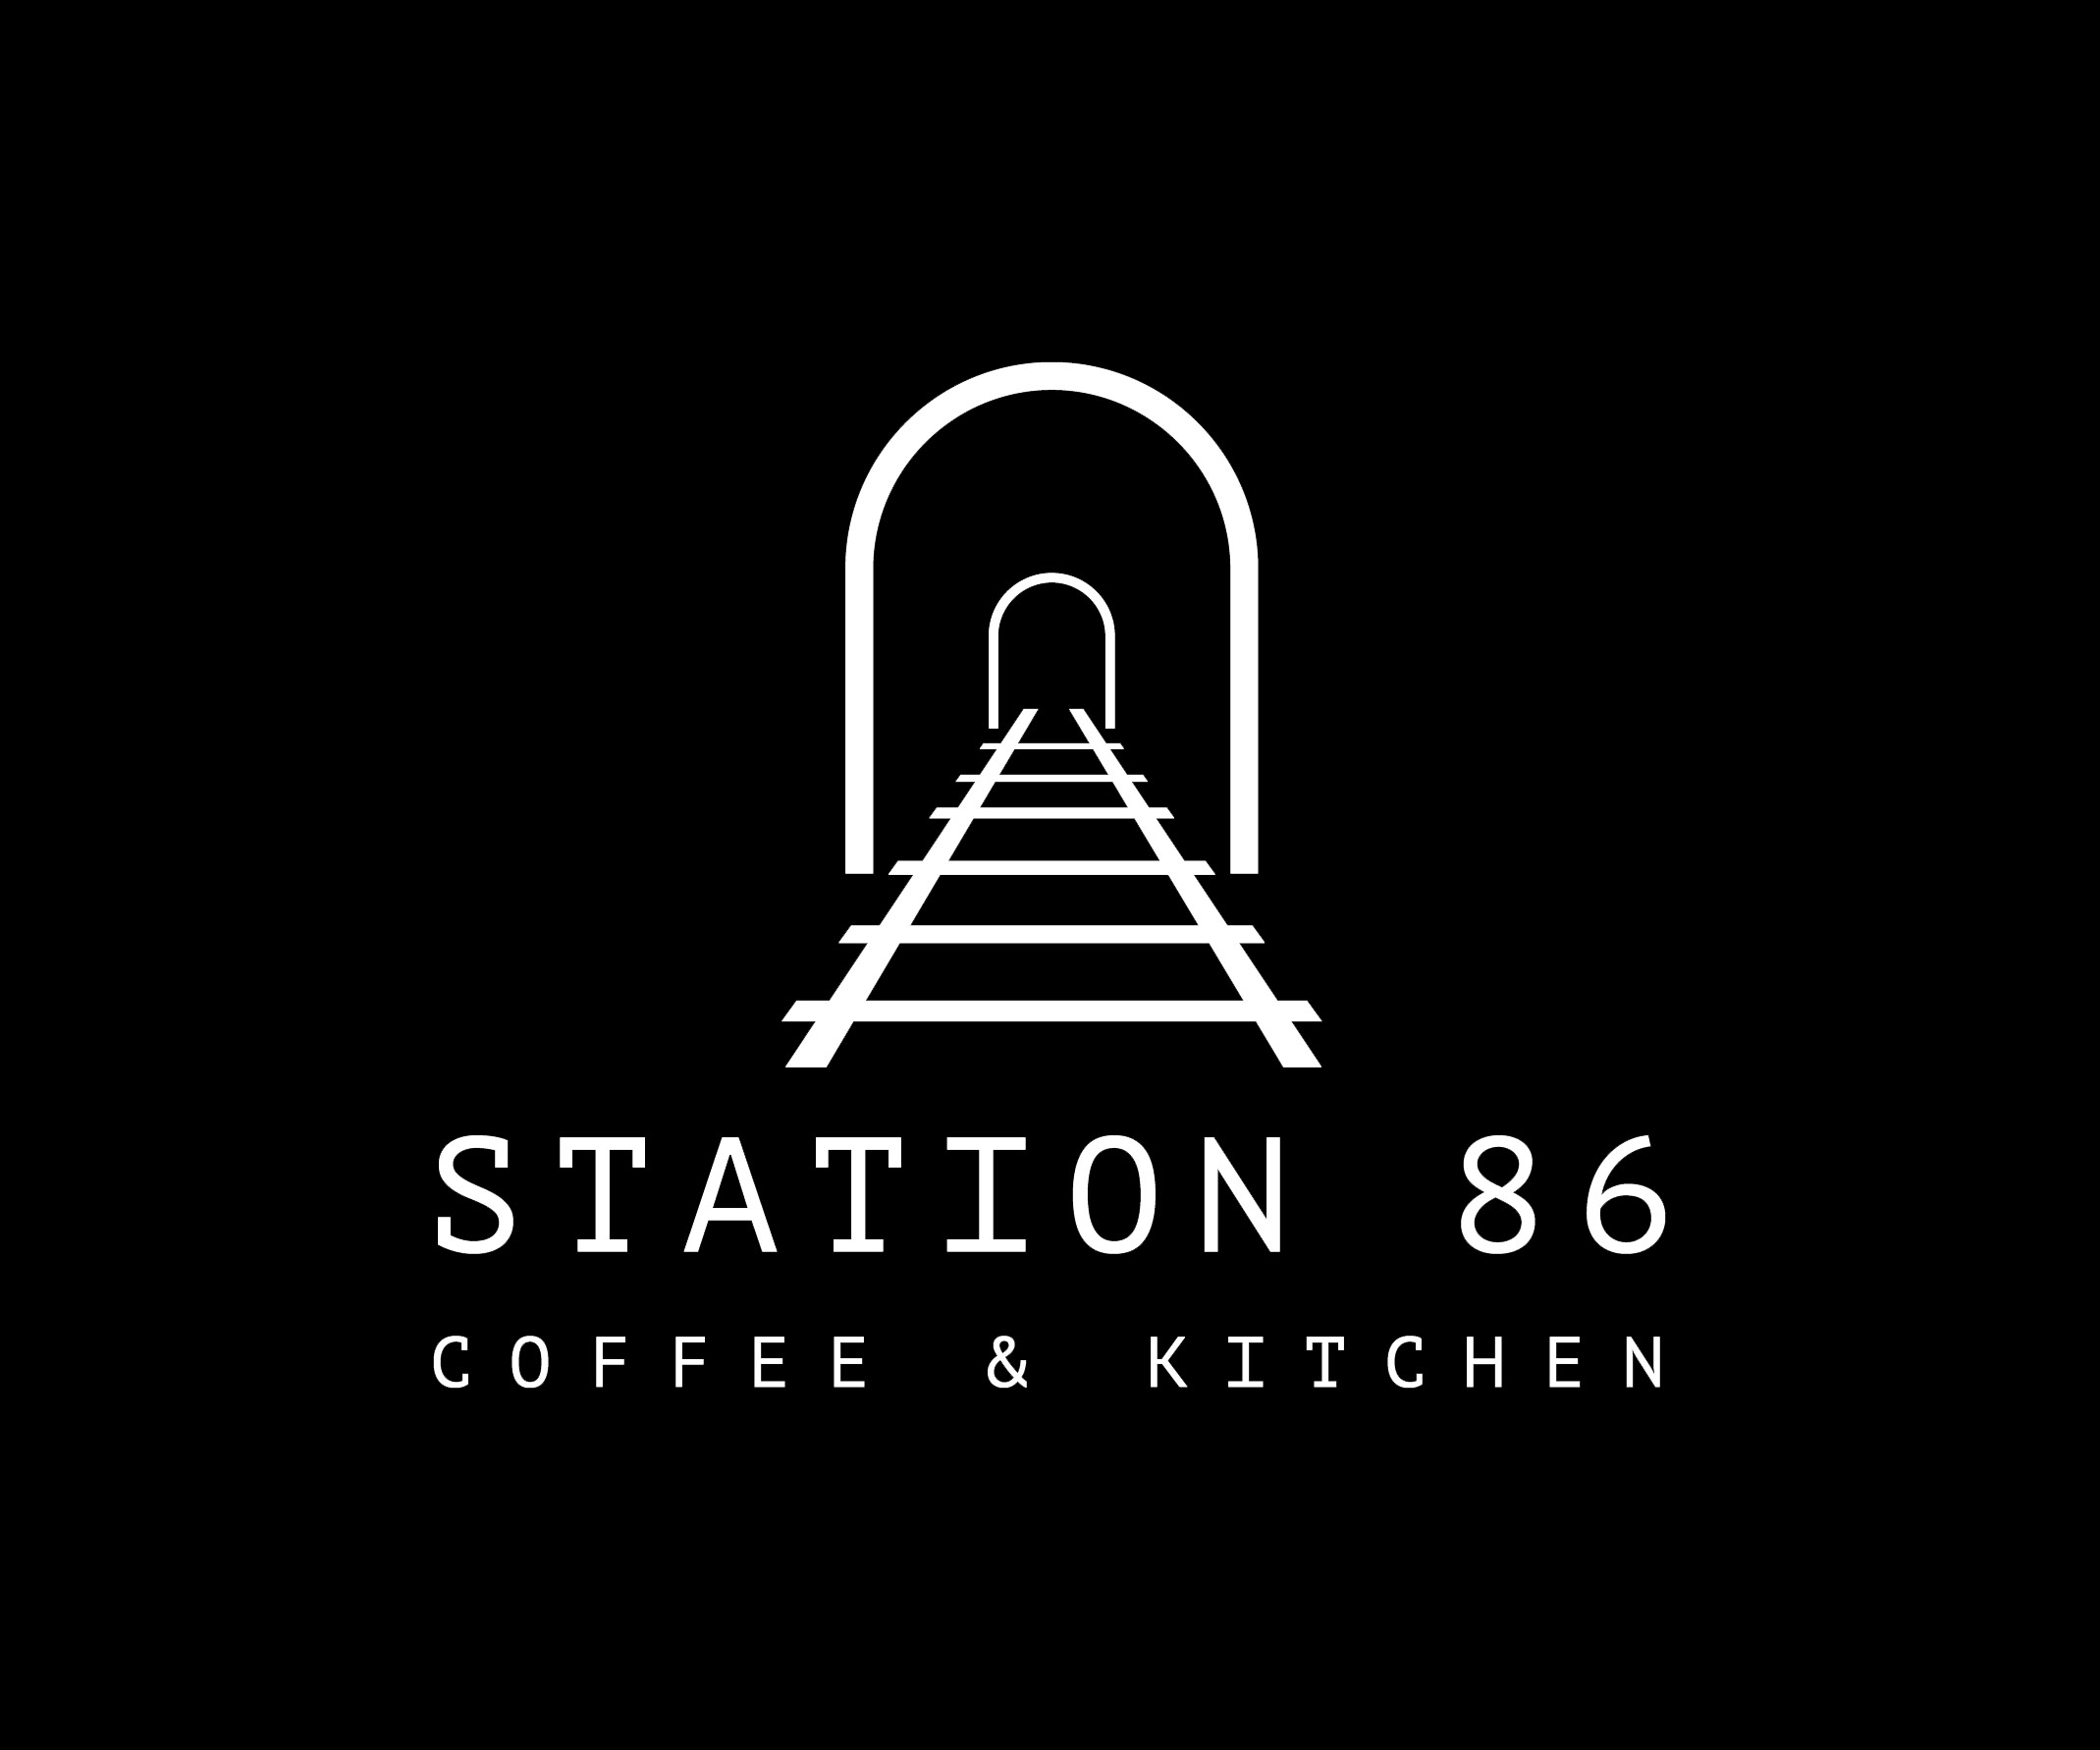 Station 86 Railway Logo White on Black.jpg